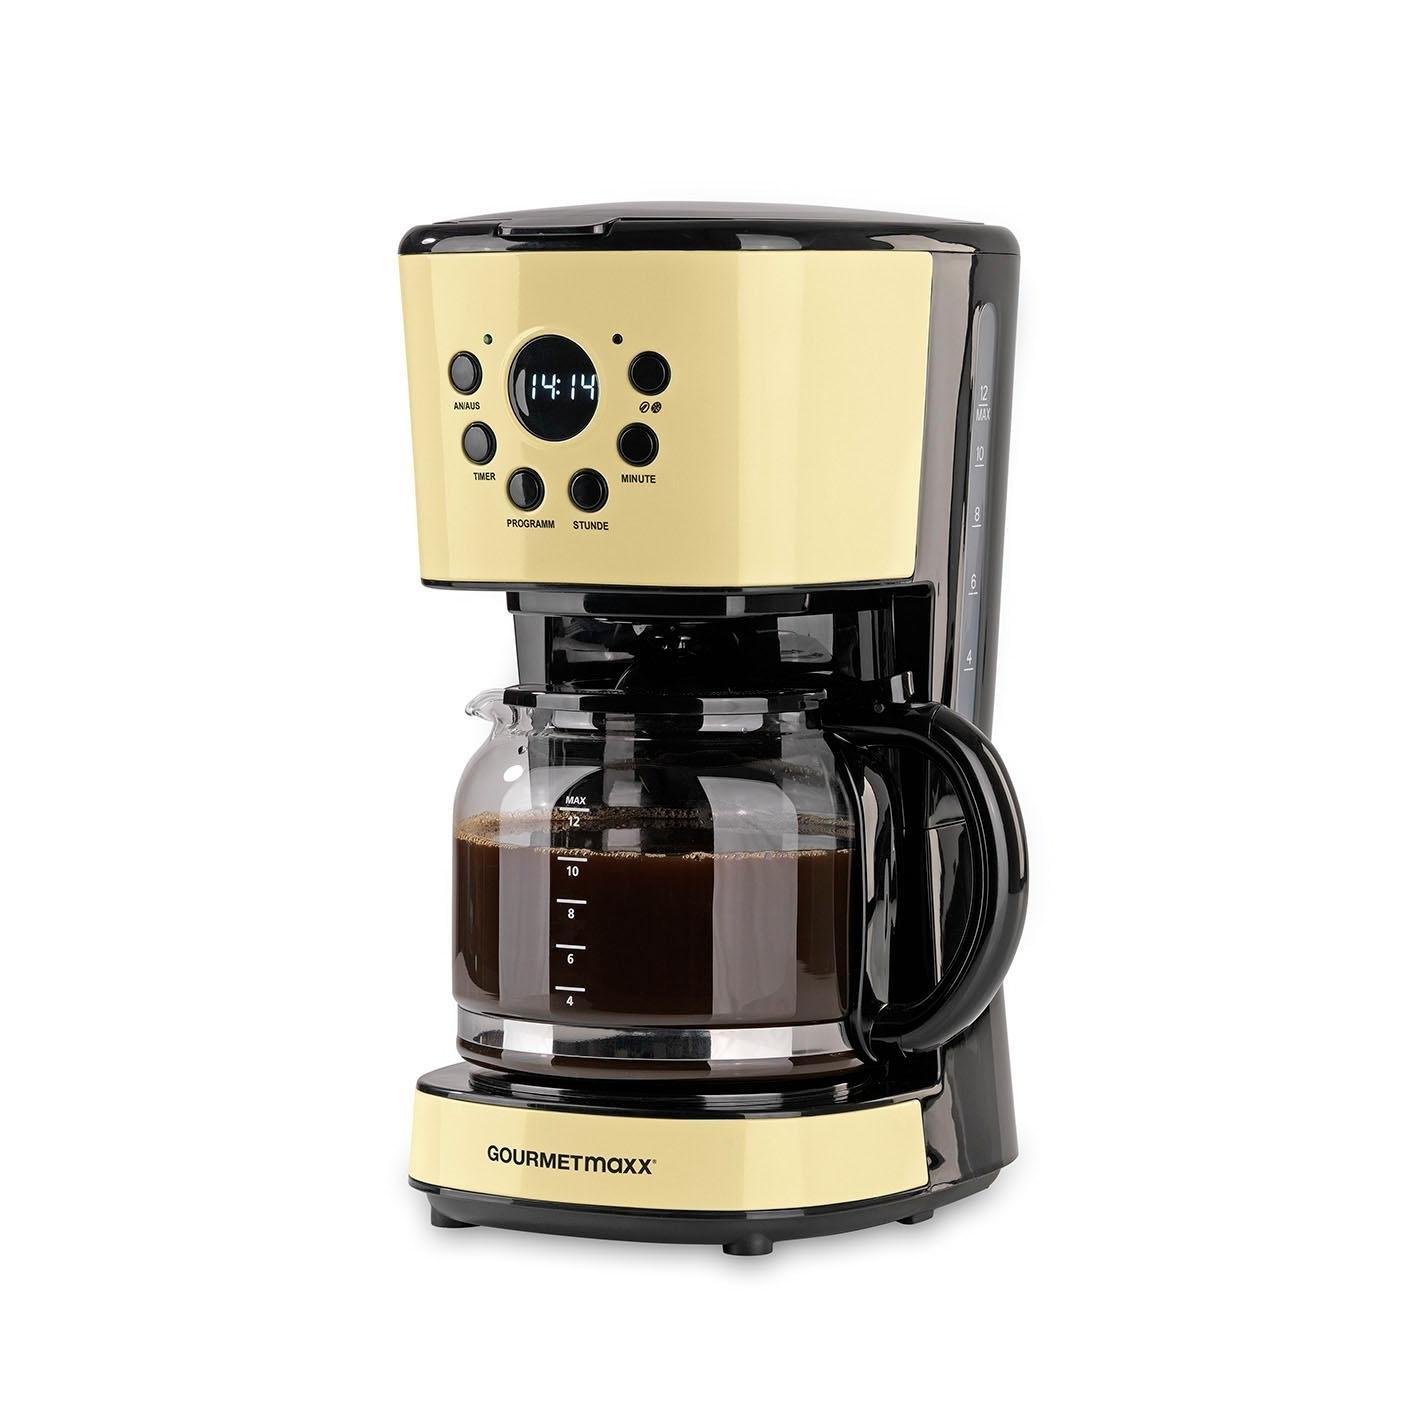 Gourmetmaxx koffiezetapparaat Retro 900W vanille, 1,5 l-kan, permanente filter 1x4 nu online bestellen